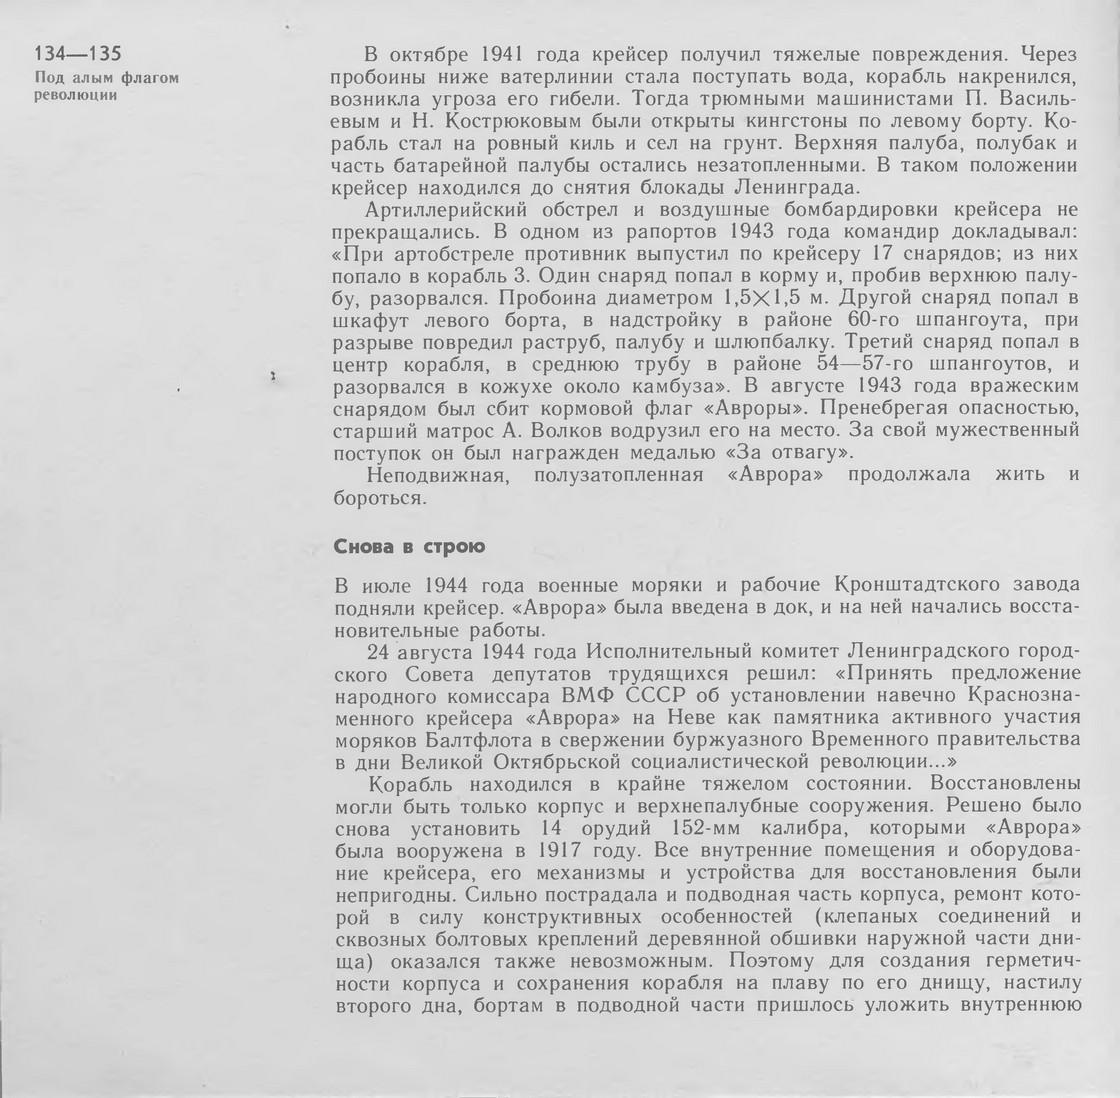 http://images.vfl.ru/ii/1515084157/95ed2587/20018354.jpg